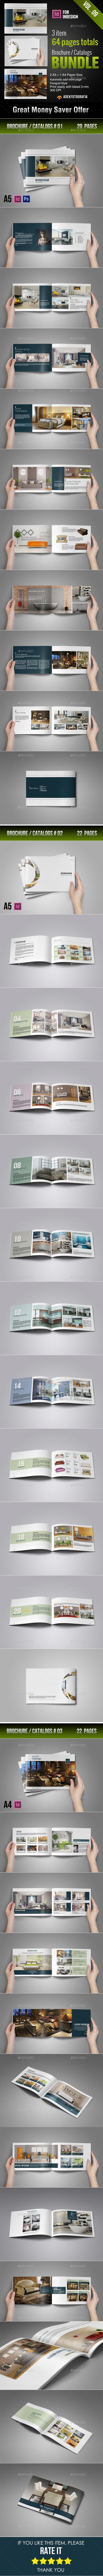 GraphicRiver Multipurpose Catalogs Brochure Bundle Vol 07 9778834